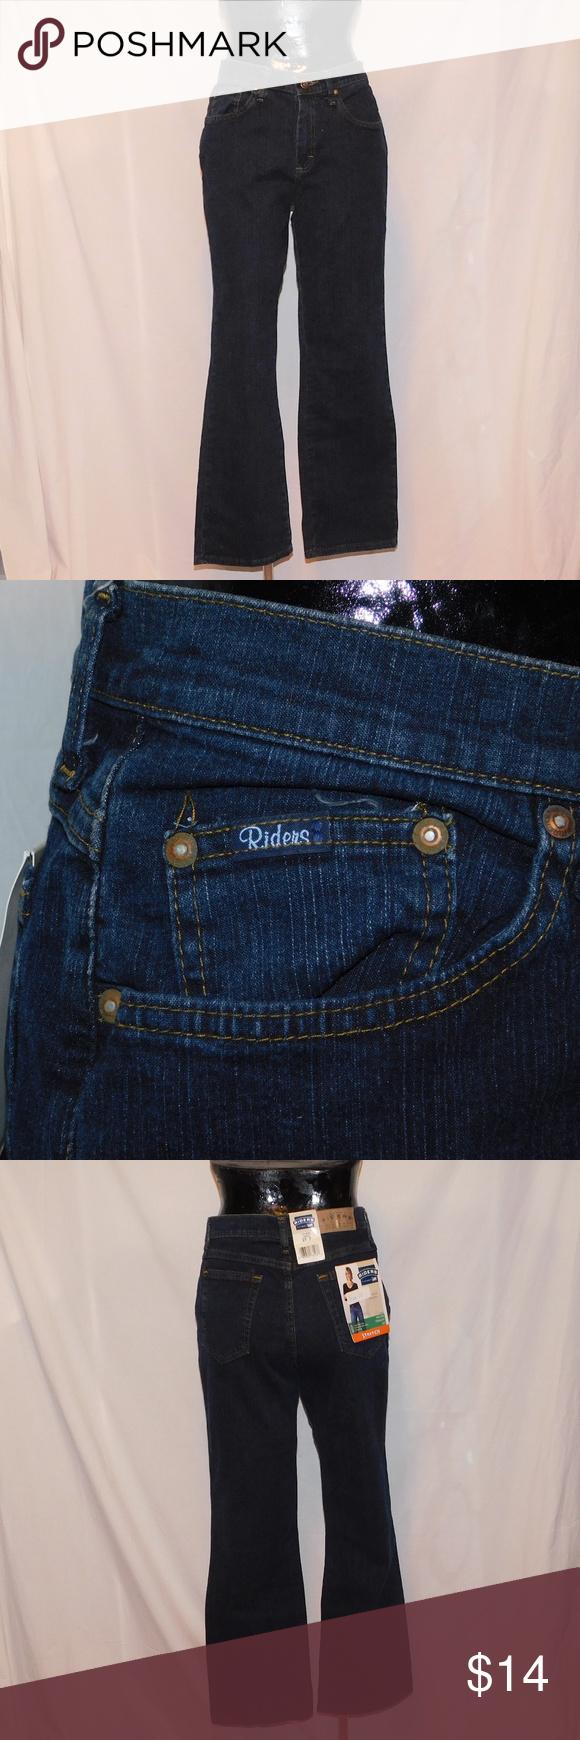 2b5bd75b LEE Rider Mid Rise Stretch Straight Leg Jeans LEE Rider, Women's Size 10 P.